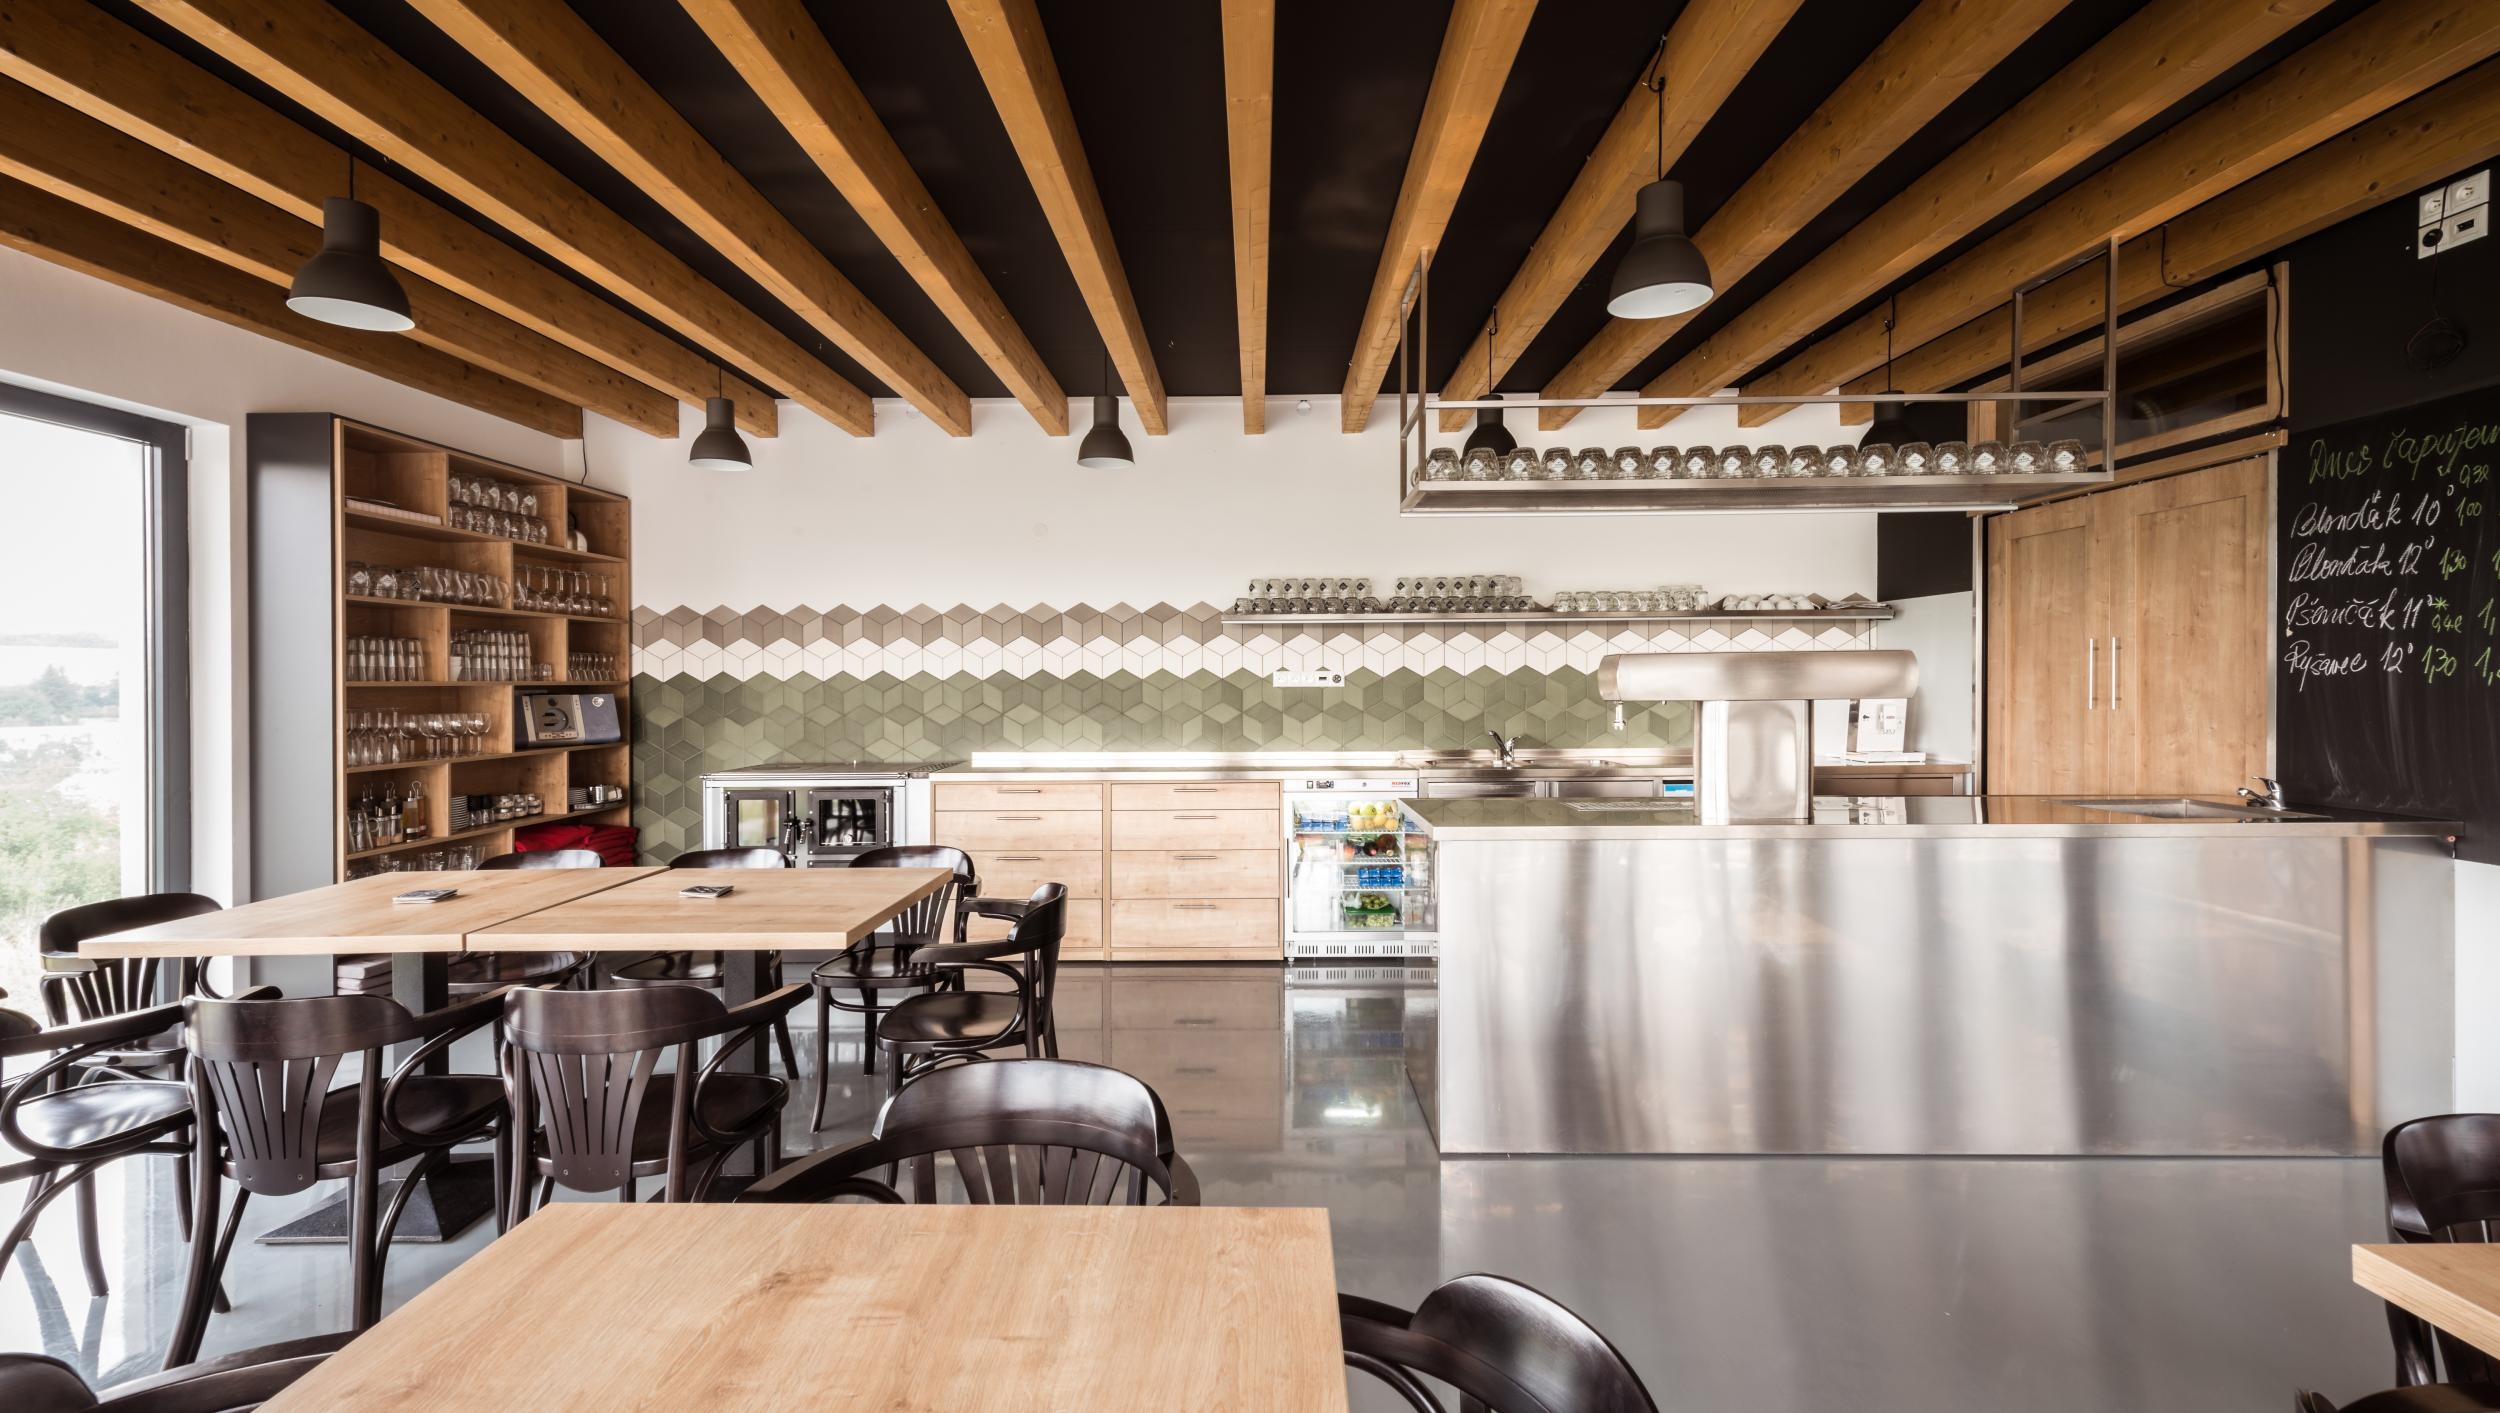 Interior Nature Design For Restaurant : Natural interior of restaurant at the distillery stara